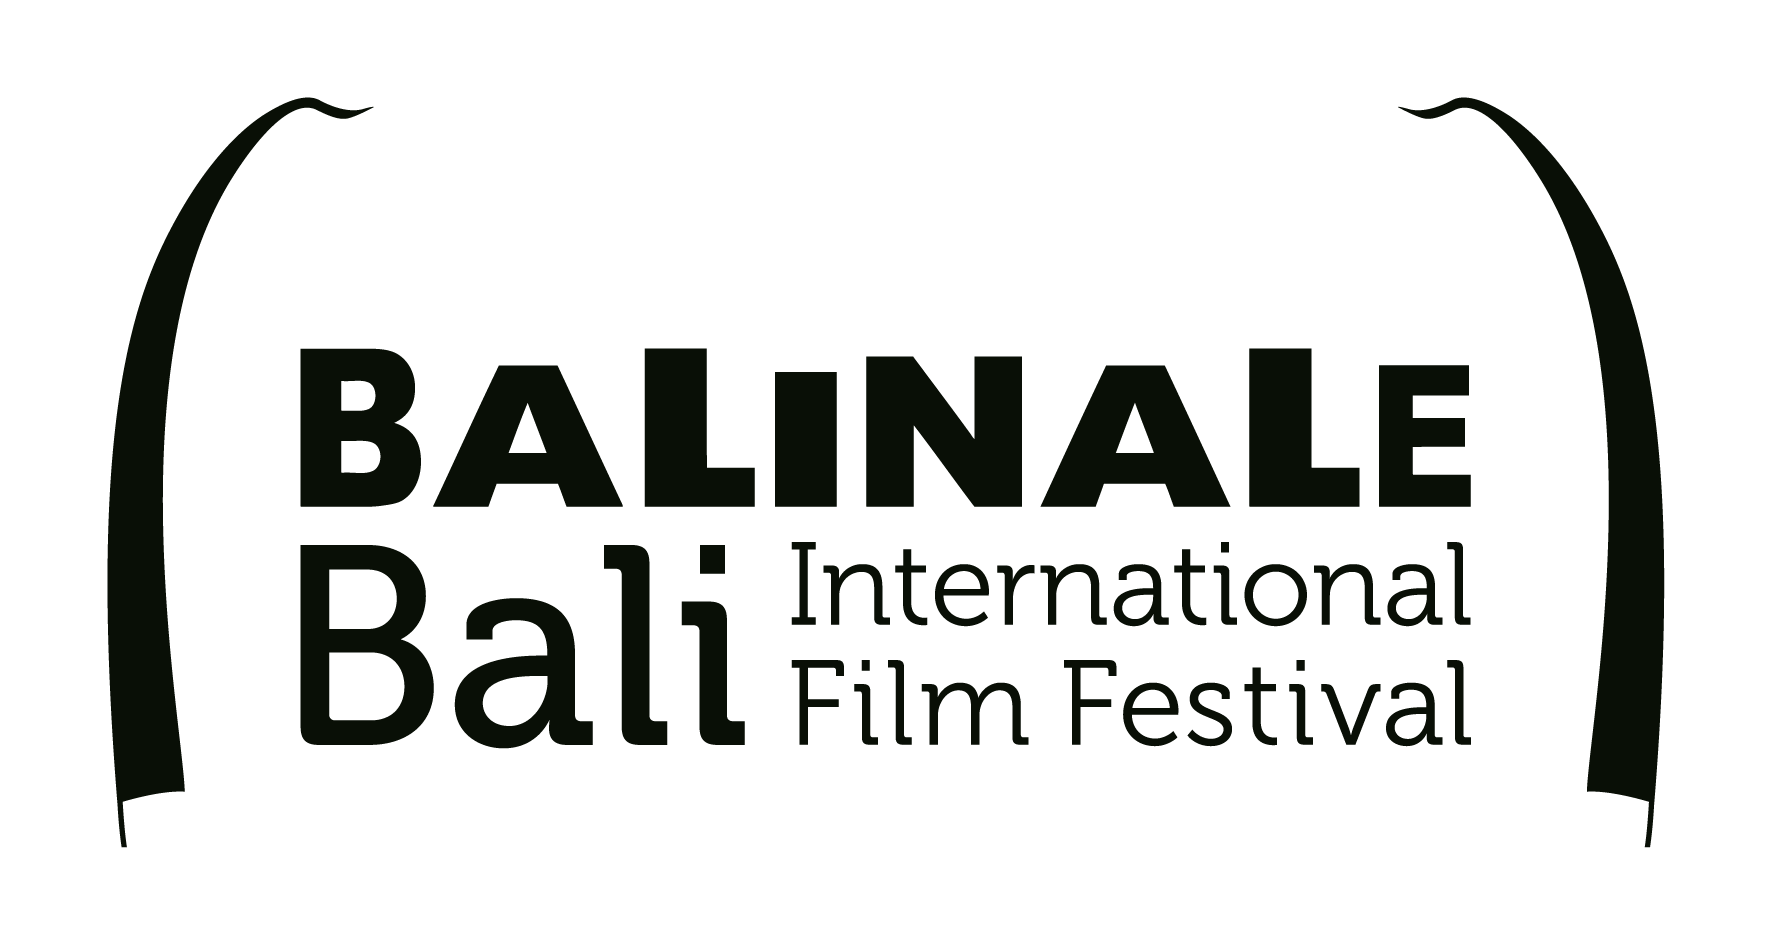 https://highend-traveller.com/citilink-is-the-official-airline-partner-of-bali-film-festival/